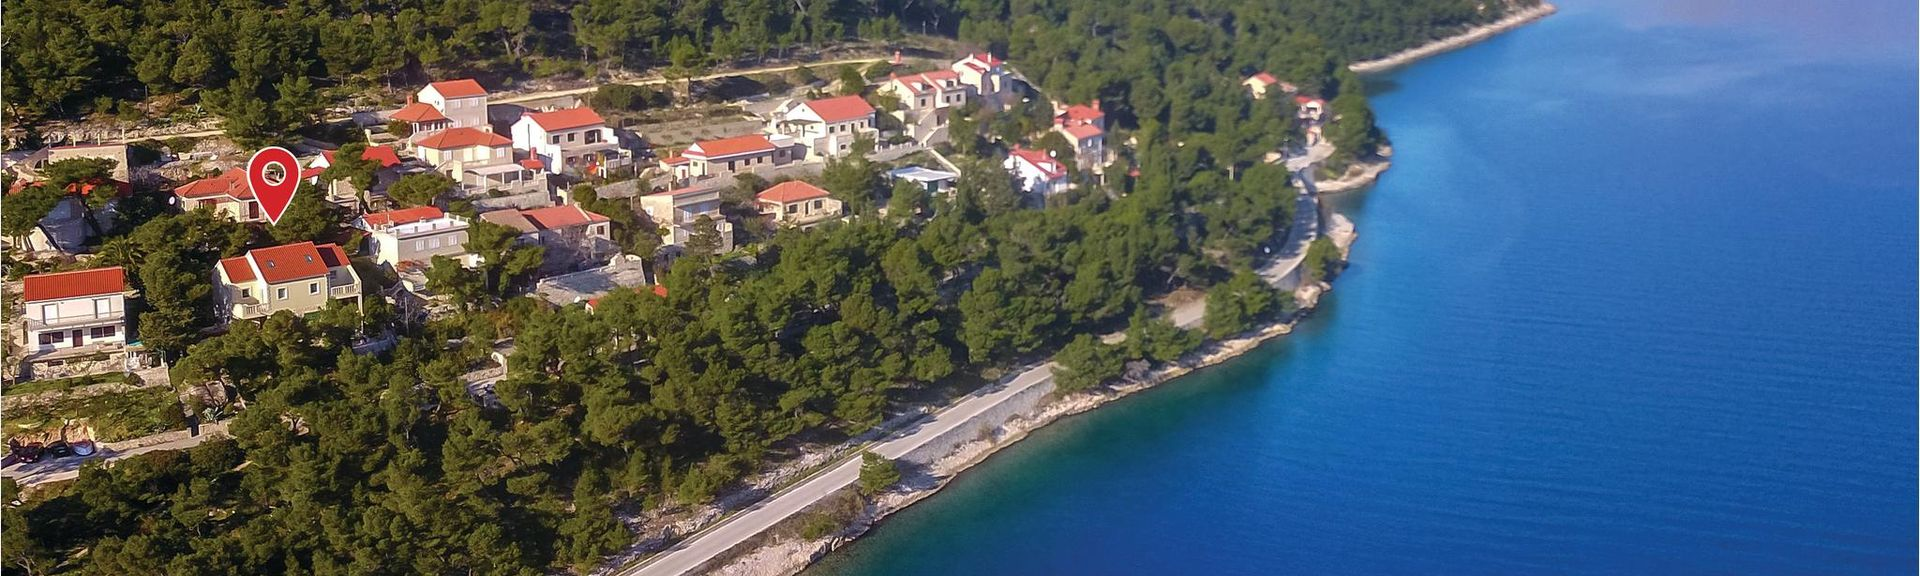 Dominicanenklooster, Bol, Split-Dalmatië, Kroatië